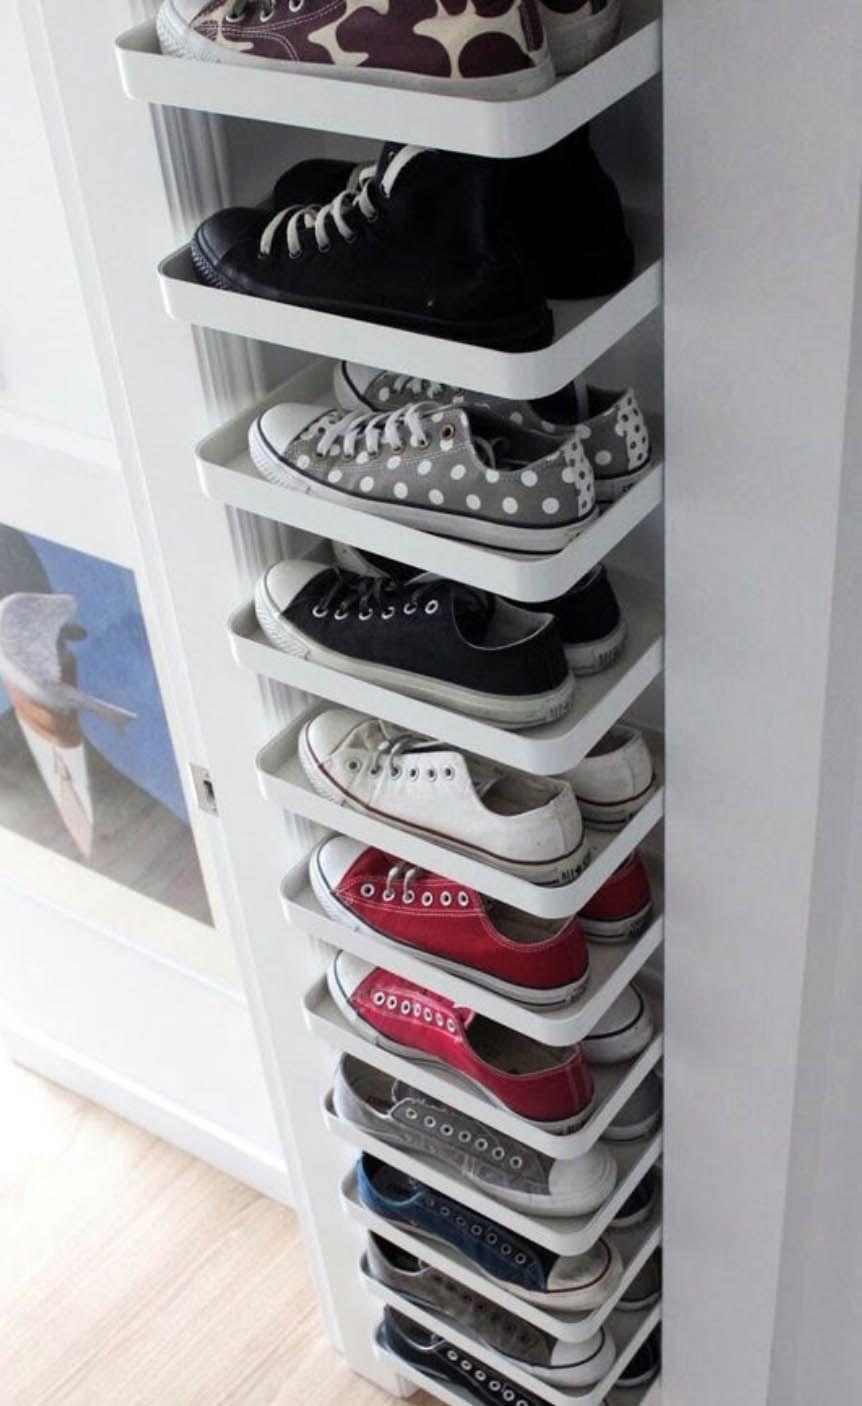 58 Comfy Minimalist Bedroom Decor Ideas Small Rooms Minimalist Bedroom Decor Small Apartment Storage Bedroom Diy